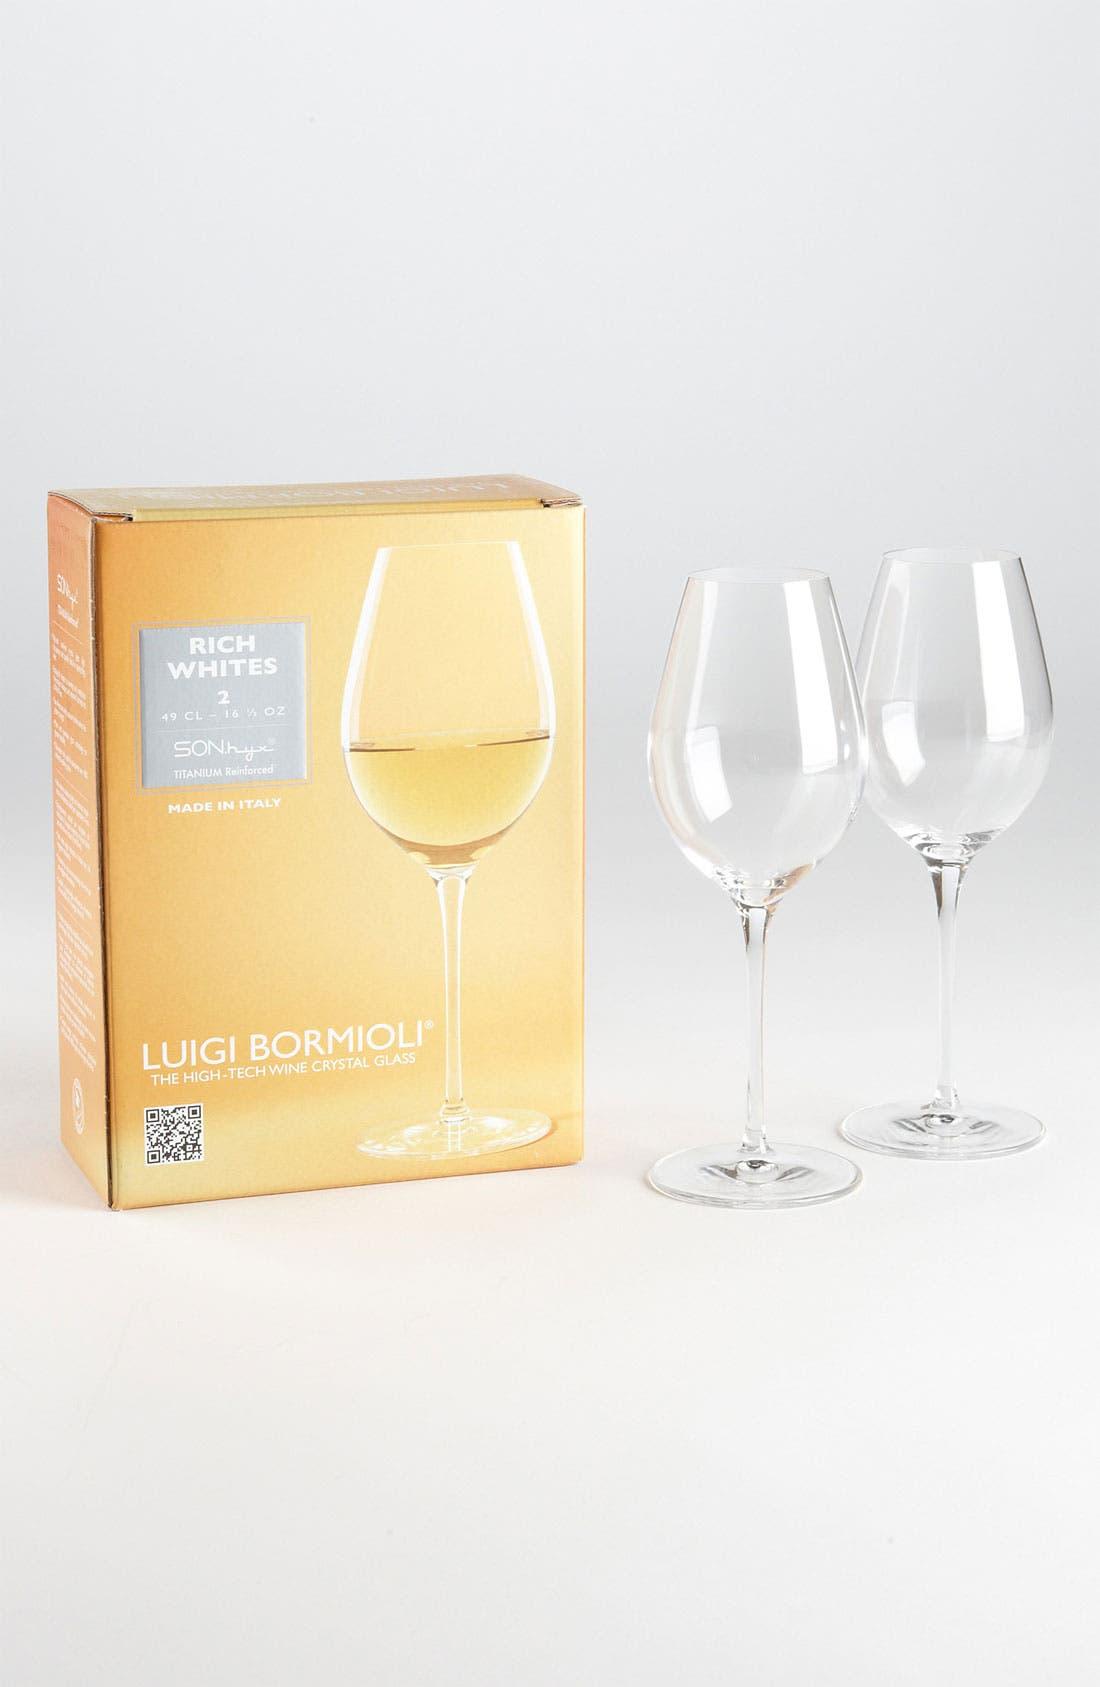 Alternate Image 1 Selected - Luigi Bormioli 'Wine Profiles - Rich Whites' Wine Glasses (Set of 2)